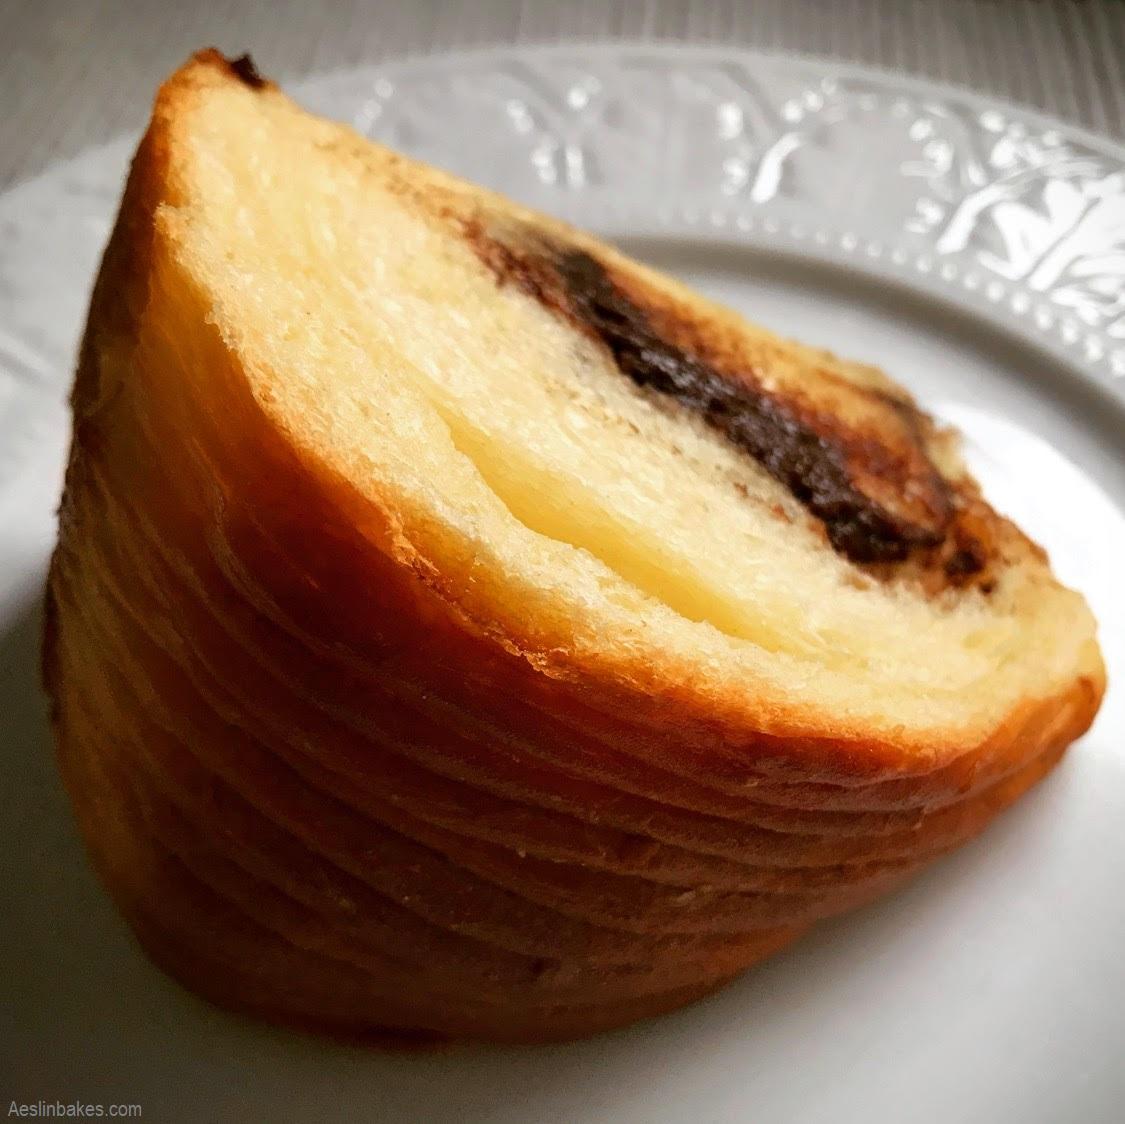 wedge of brioche with praline gianduja